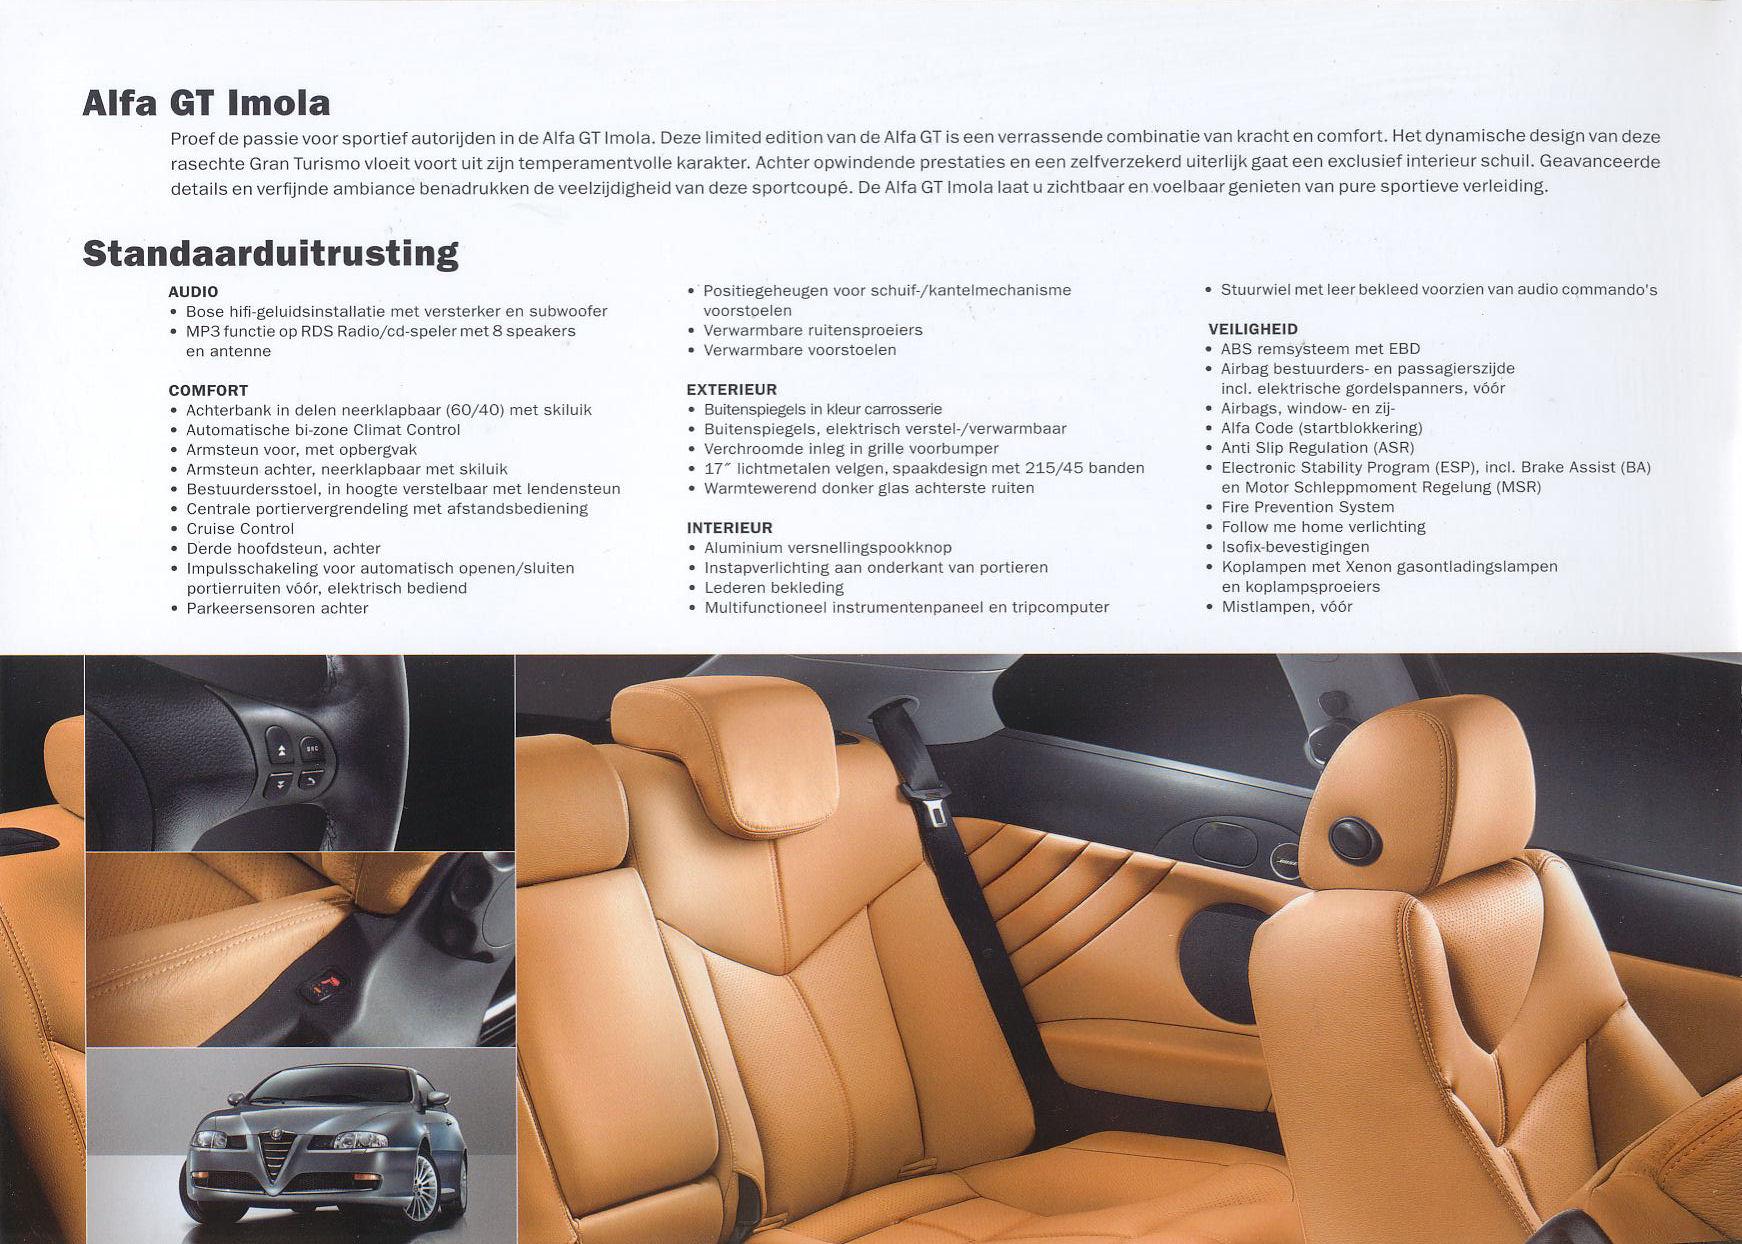 2007 Alfa Romeo GT Imola brochure